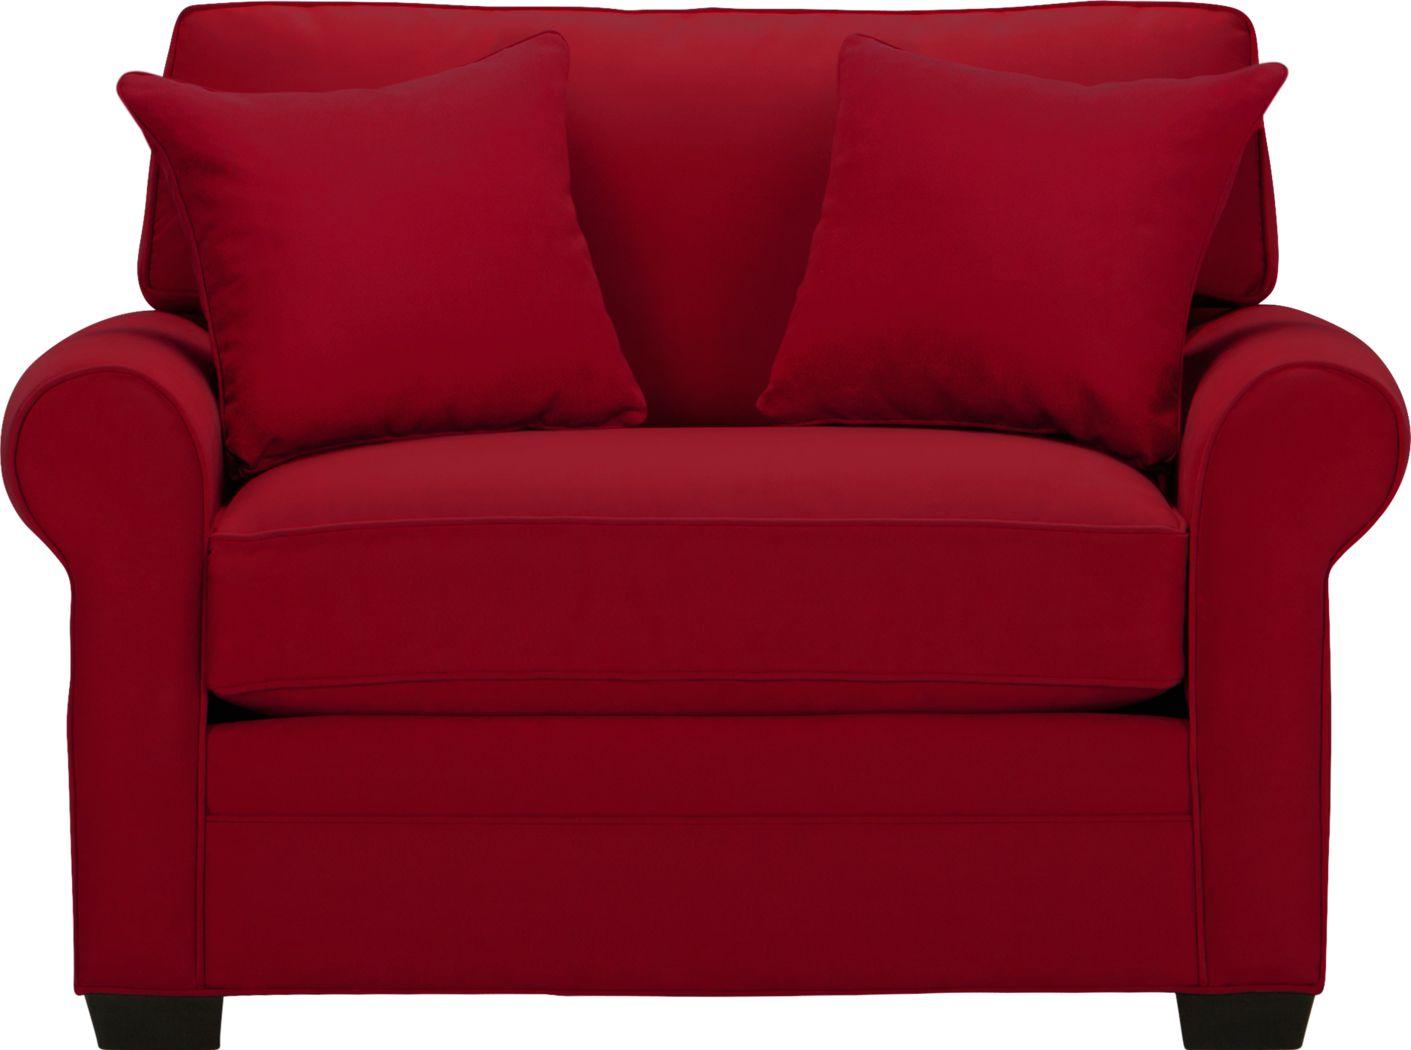 Cindy Crawford Home Bellingham Cardinal Microfiber Chair